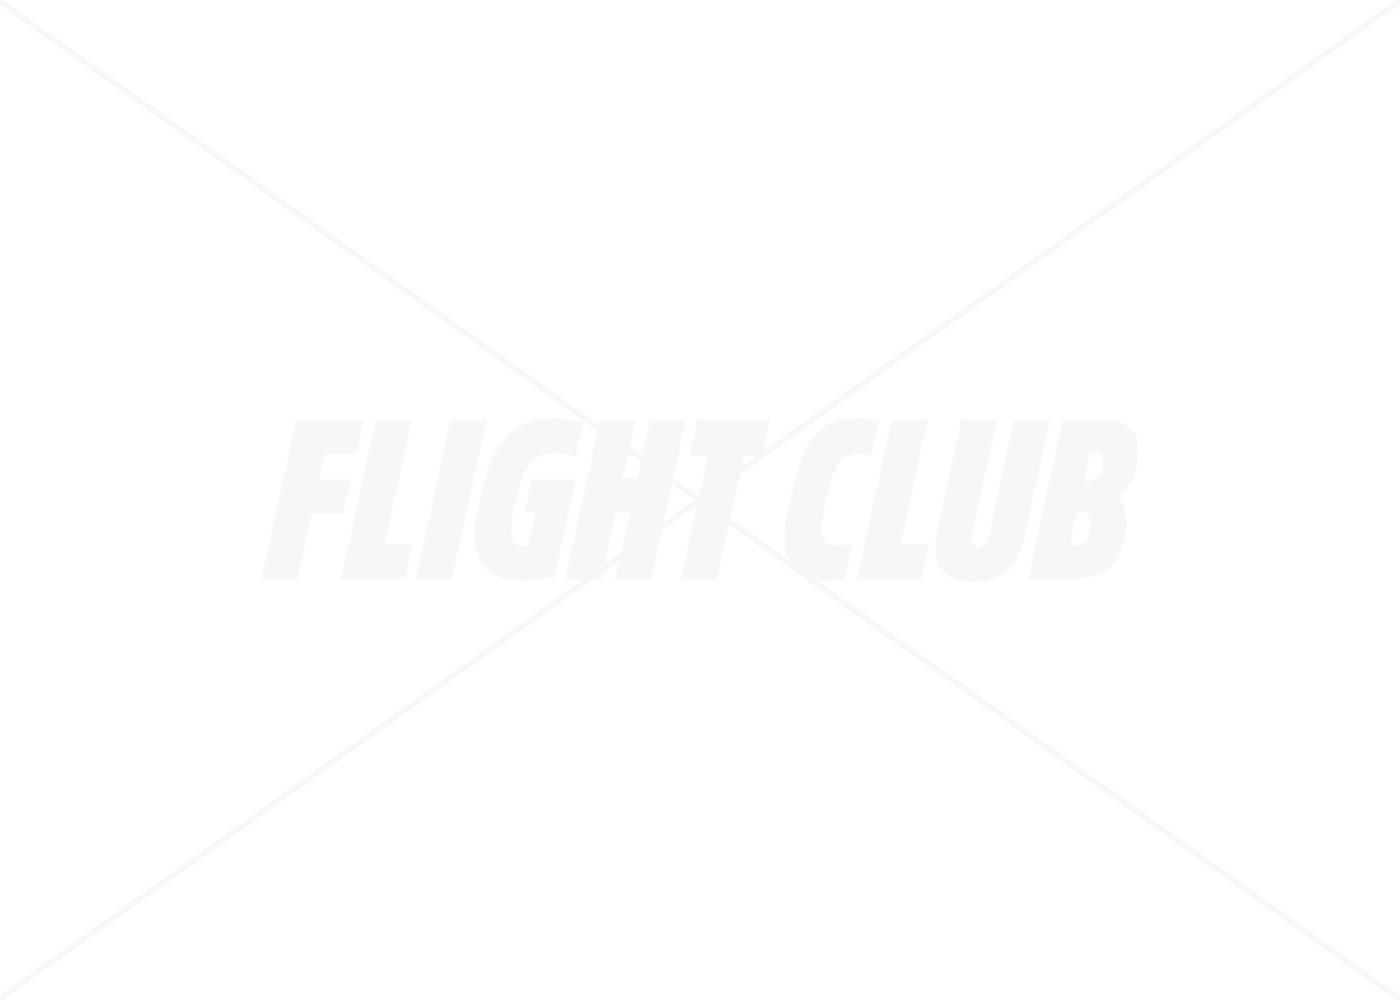 "Air Jordan 8 Retro Db (gs)""doernbecher"" Air Jordan 729894 480 hyper blue electro orange"